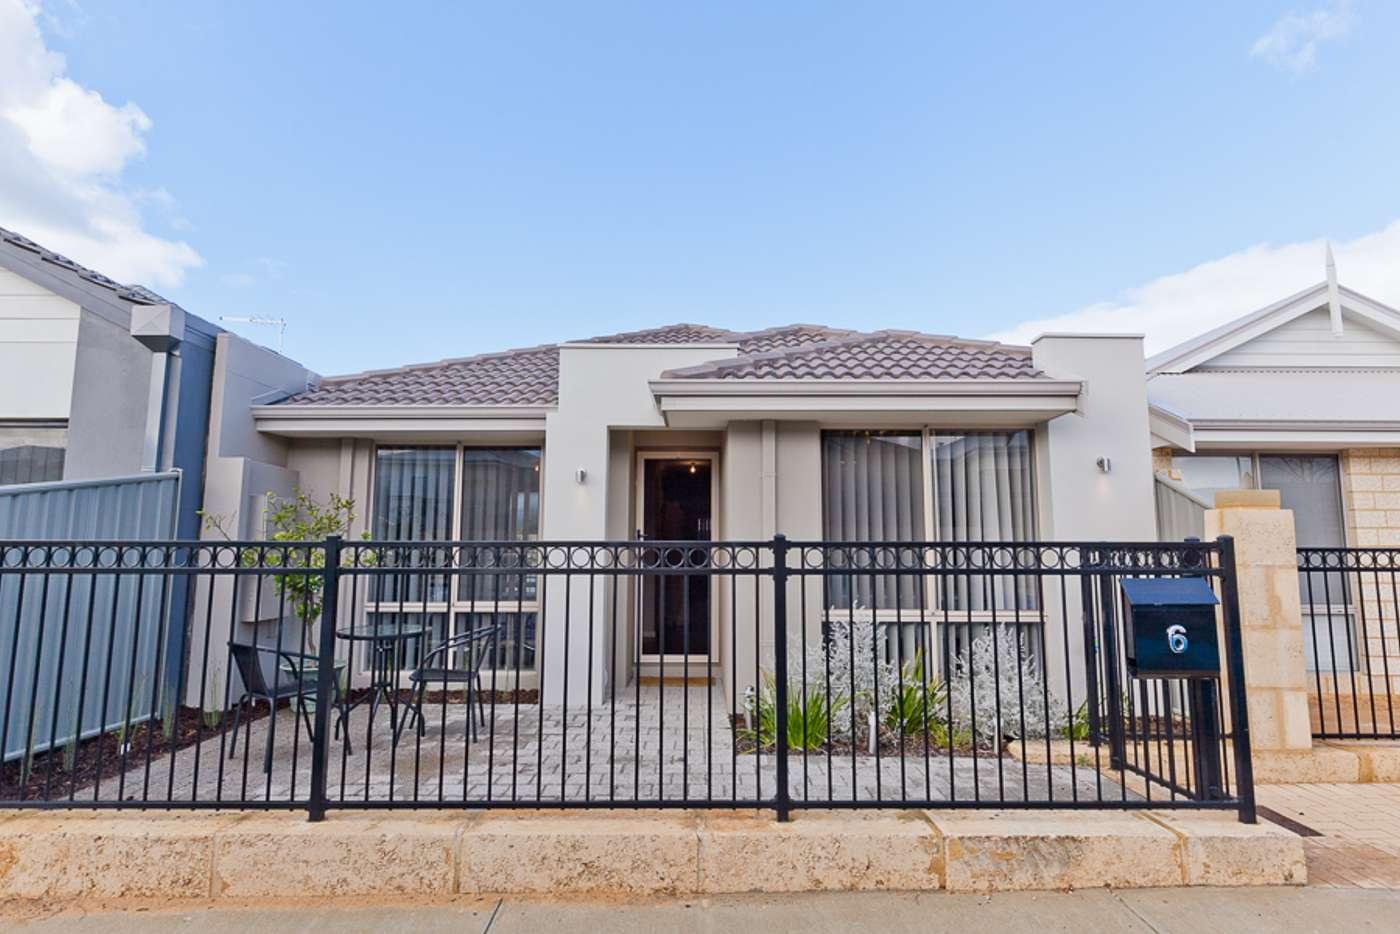 Main view of Homely house listing, 6 Corton Approach, Wellard WA 6170